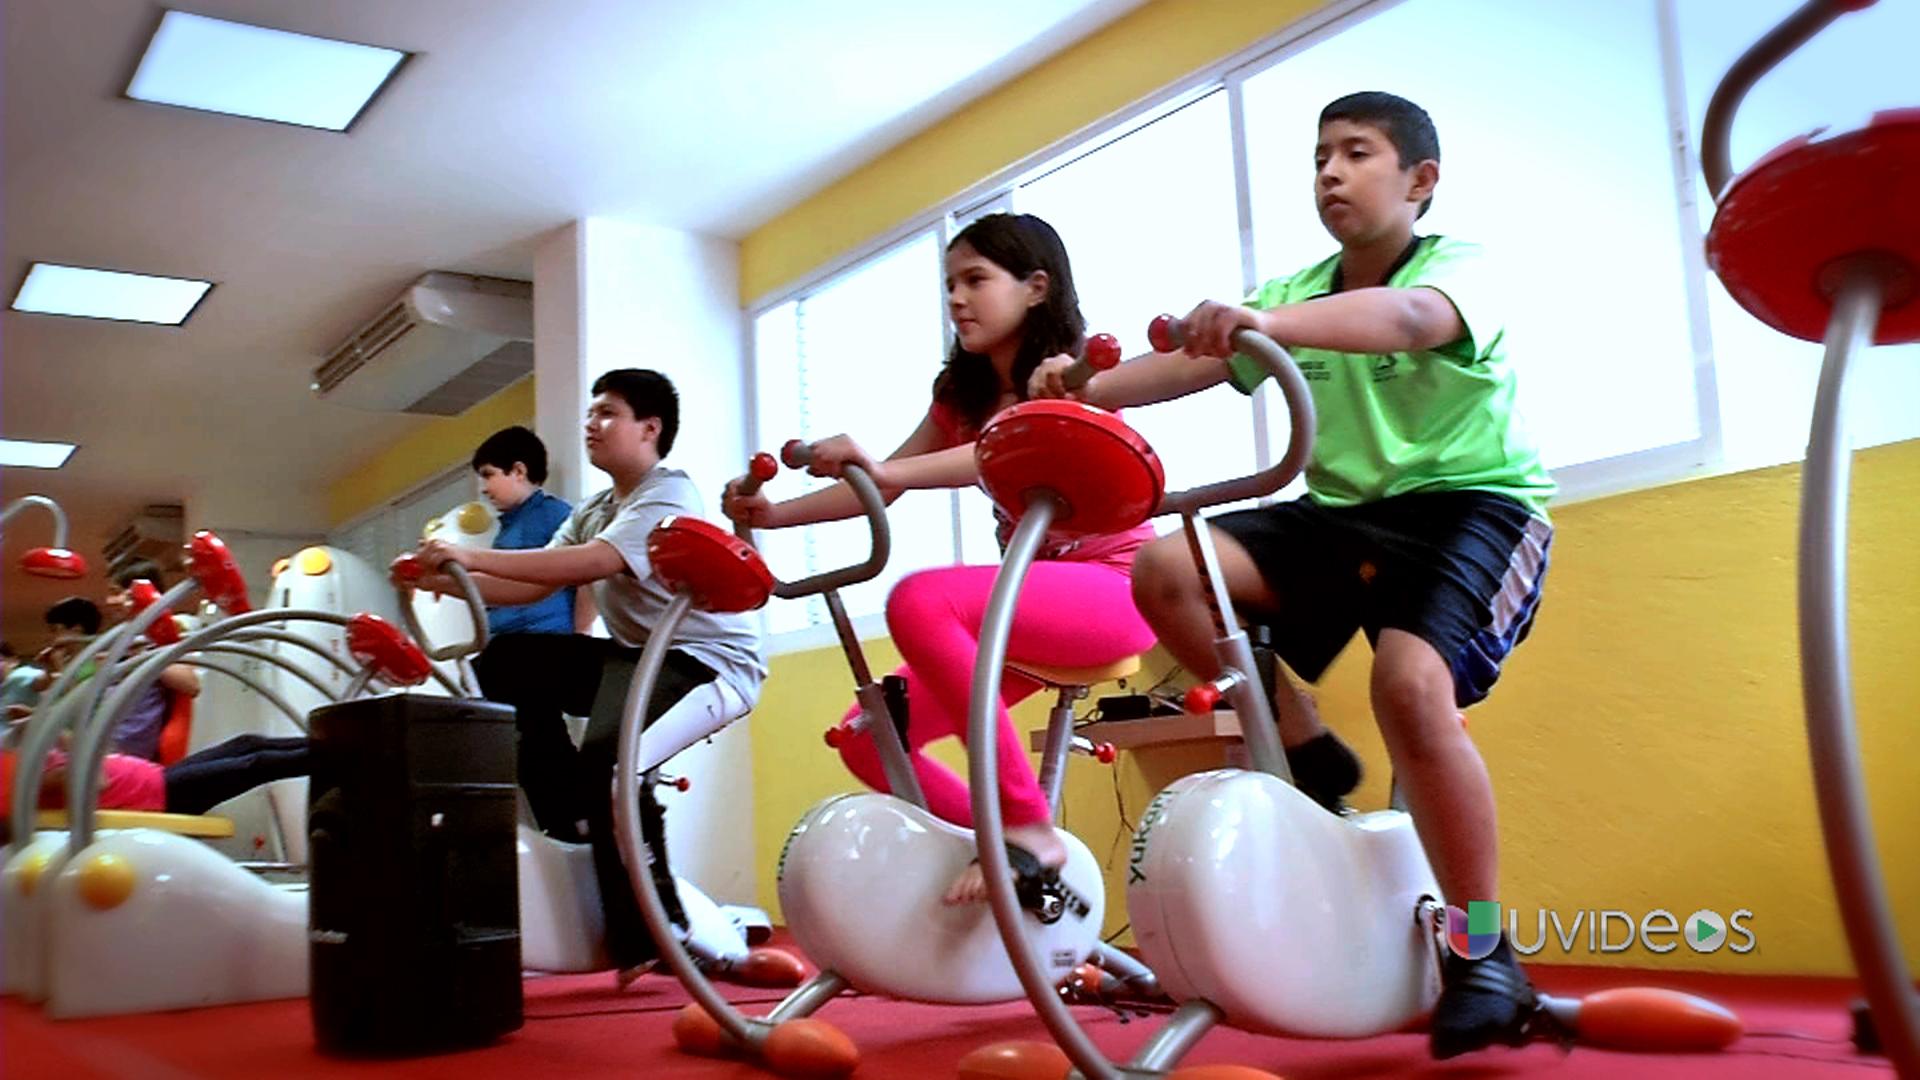 Un gimnasio para ni os le da pelea a la obesidad infantil for Para gimnasio